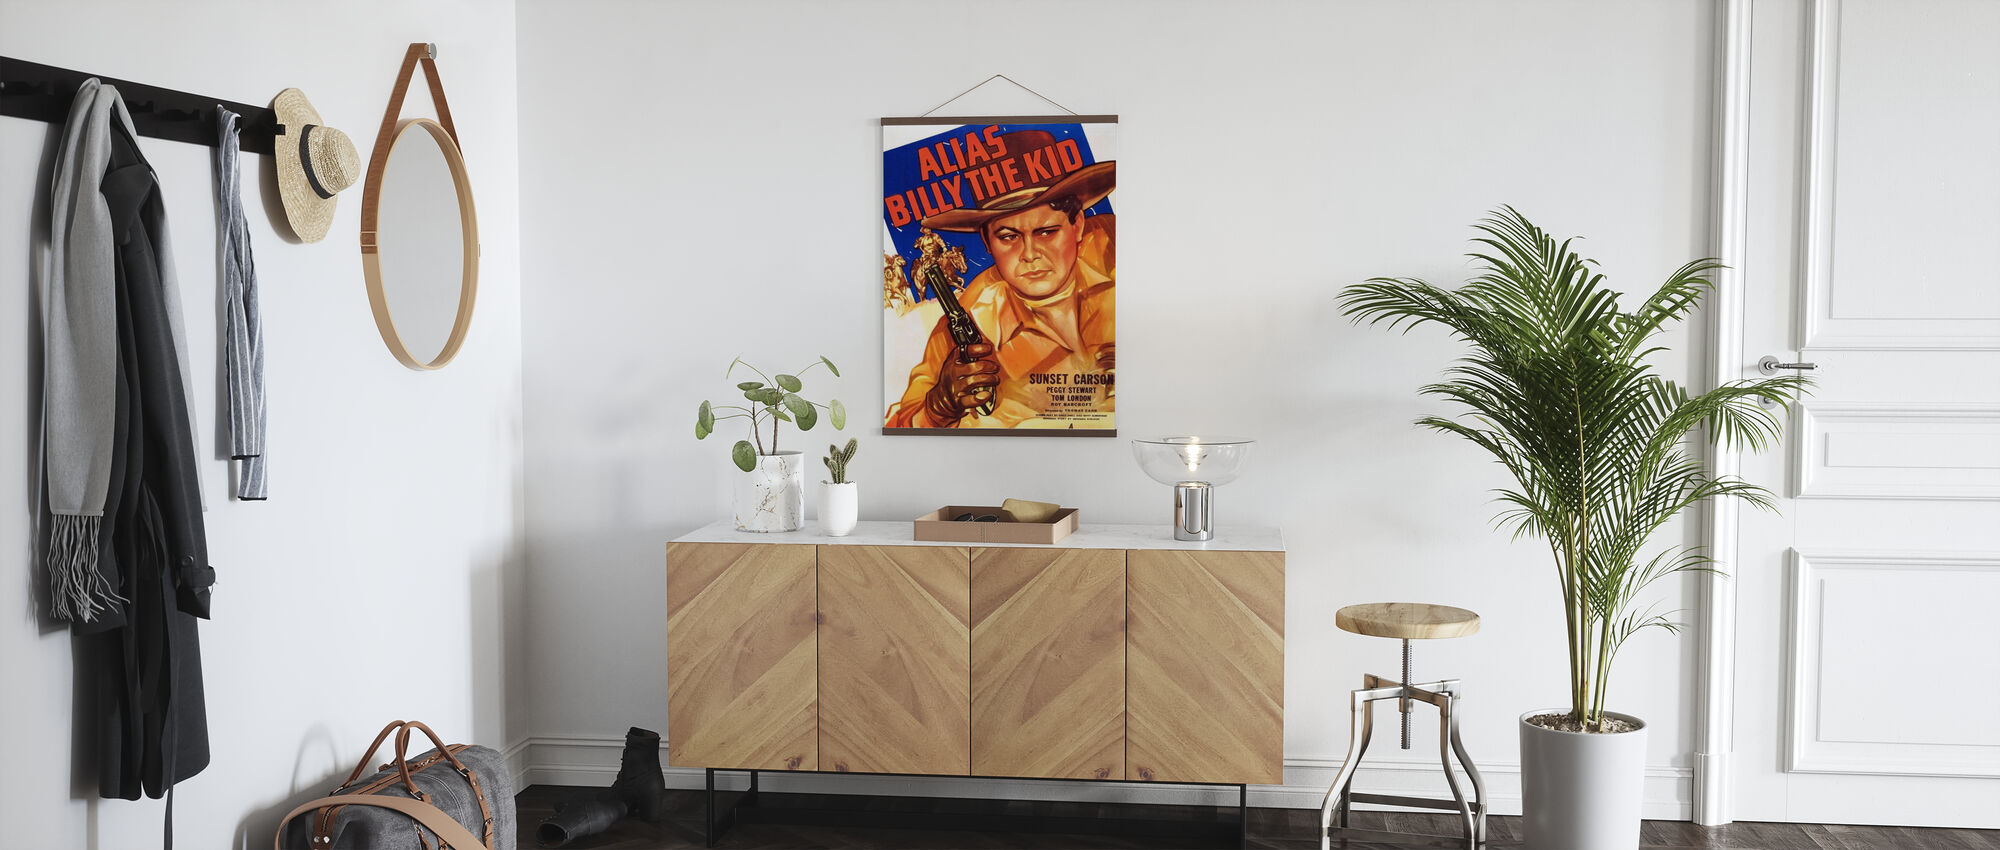 Movie Poster Alias Billy the Kid - Poster - Hallway